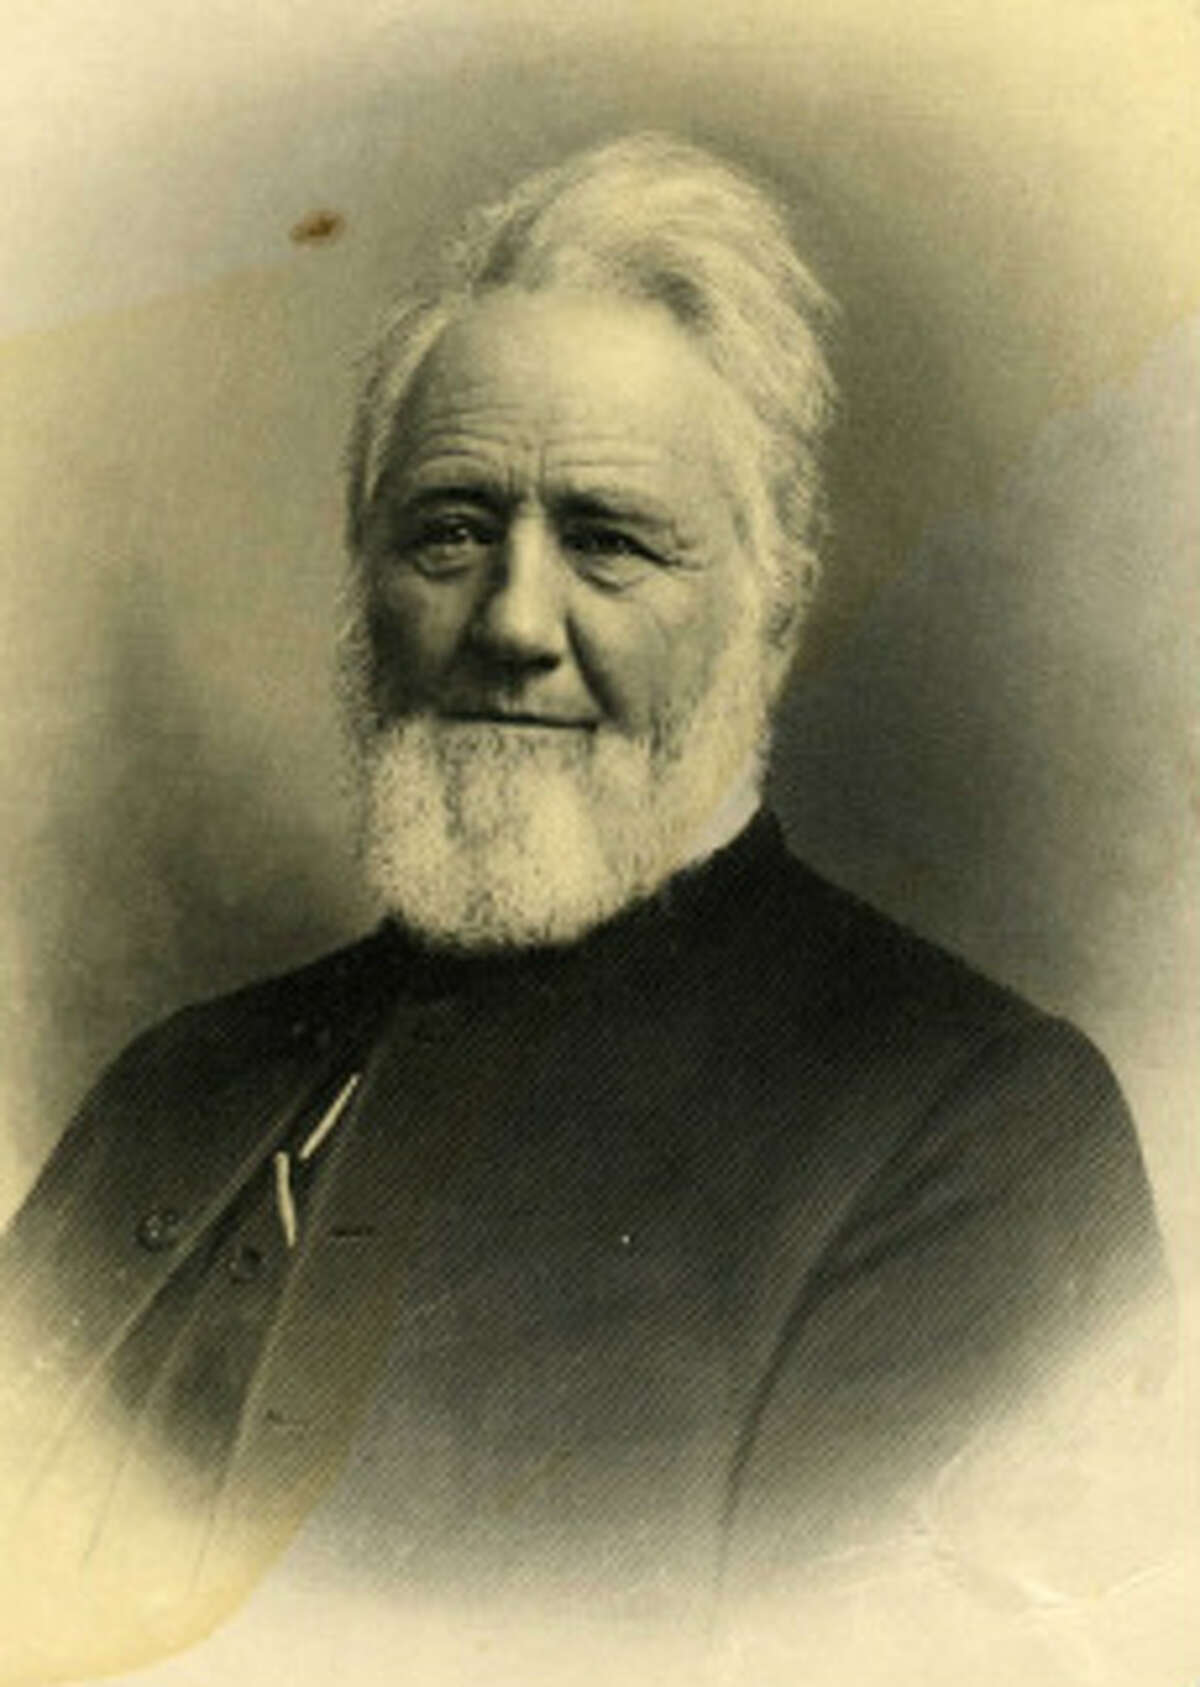 Frederick W. Gunn